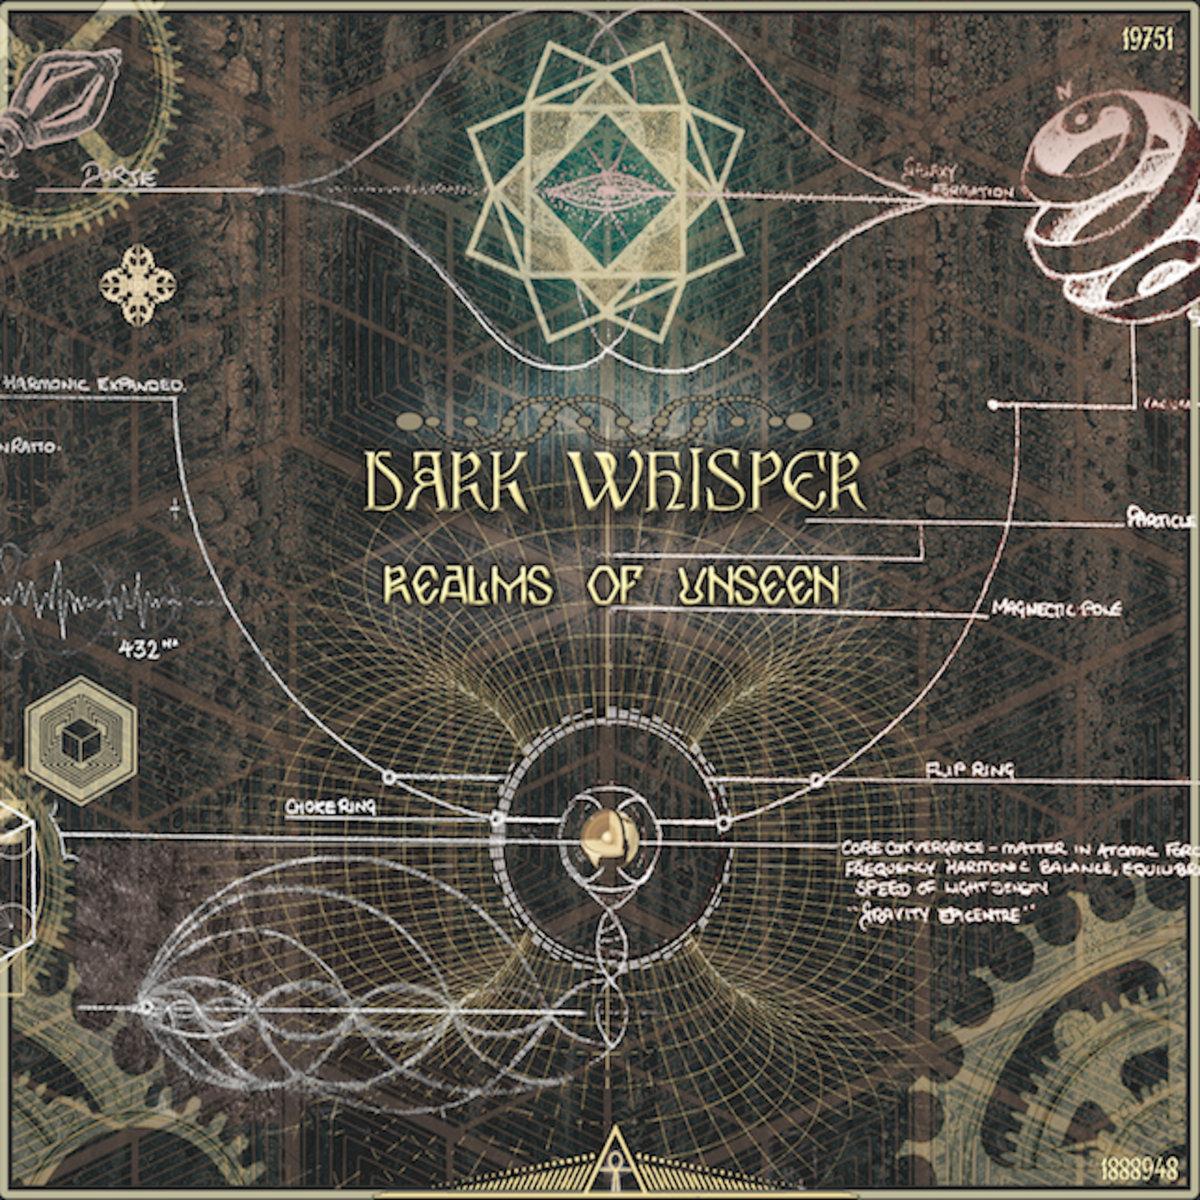 Dark Whisper - Realms of Unseen | Alice D